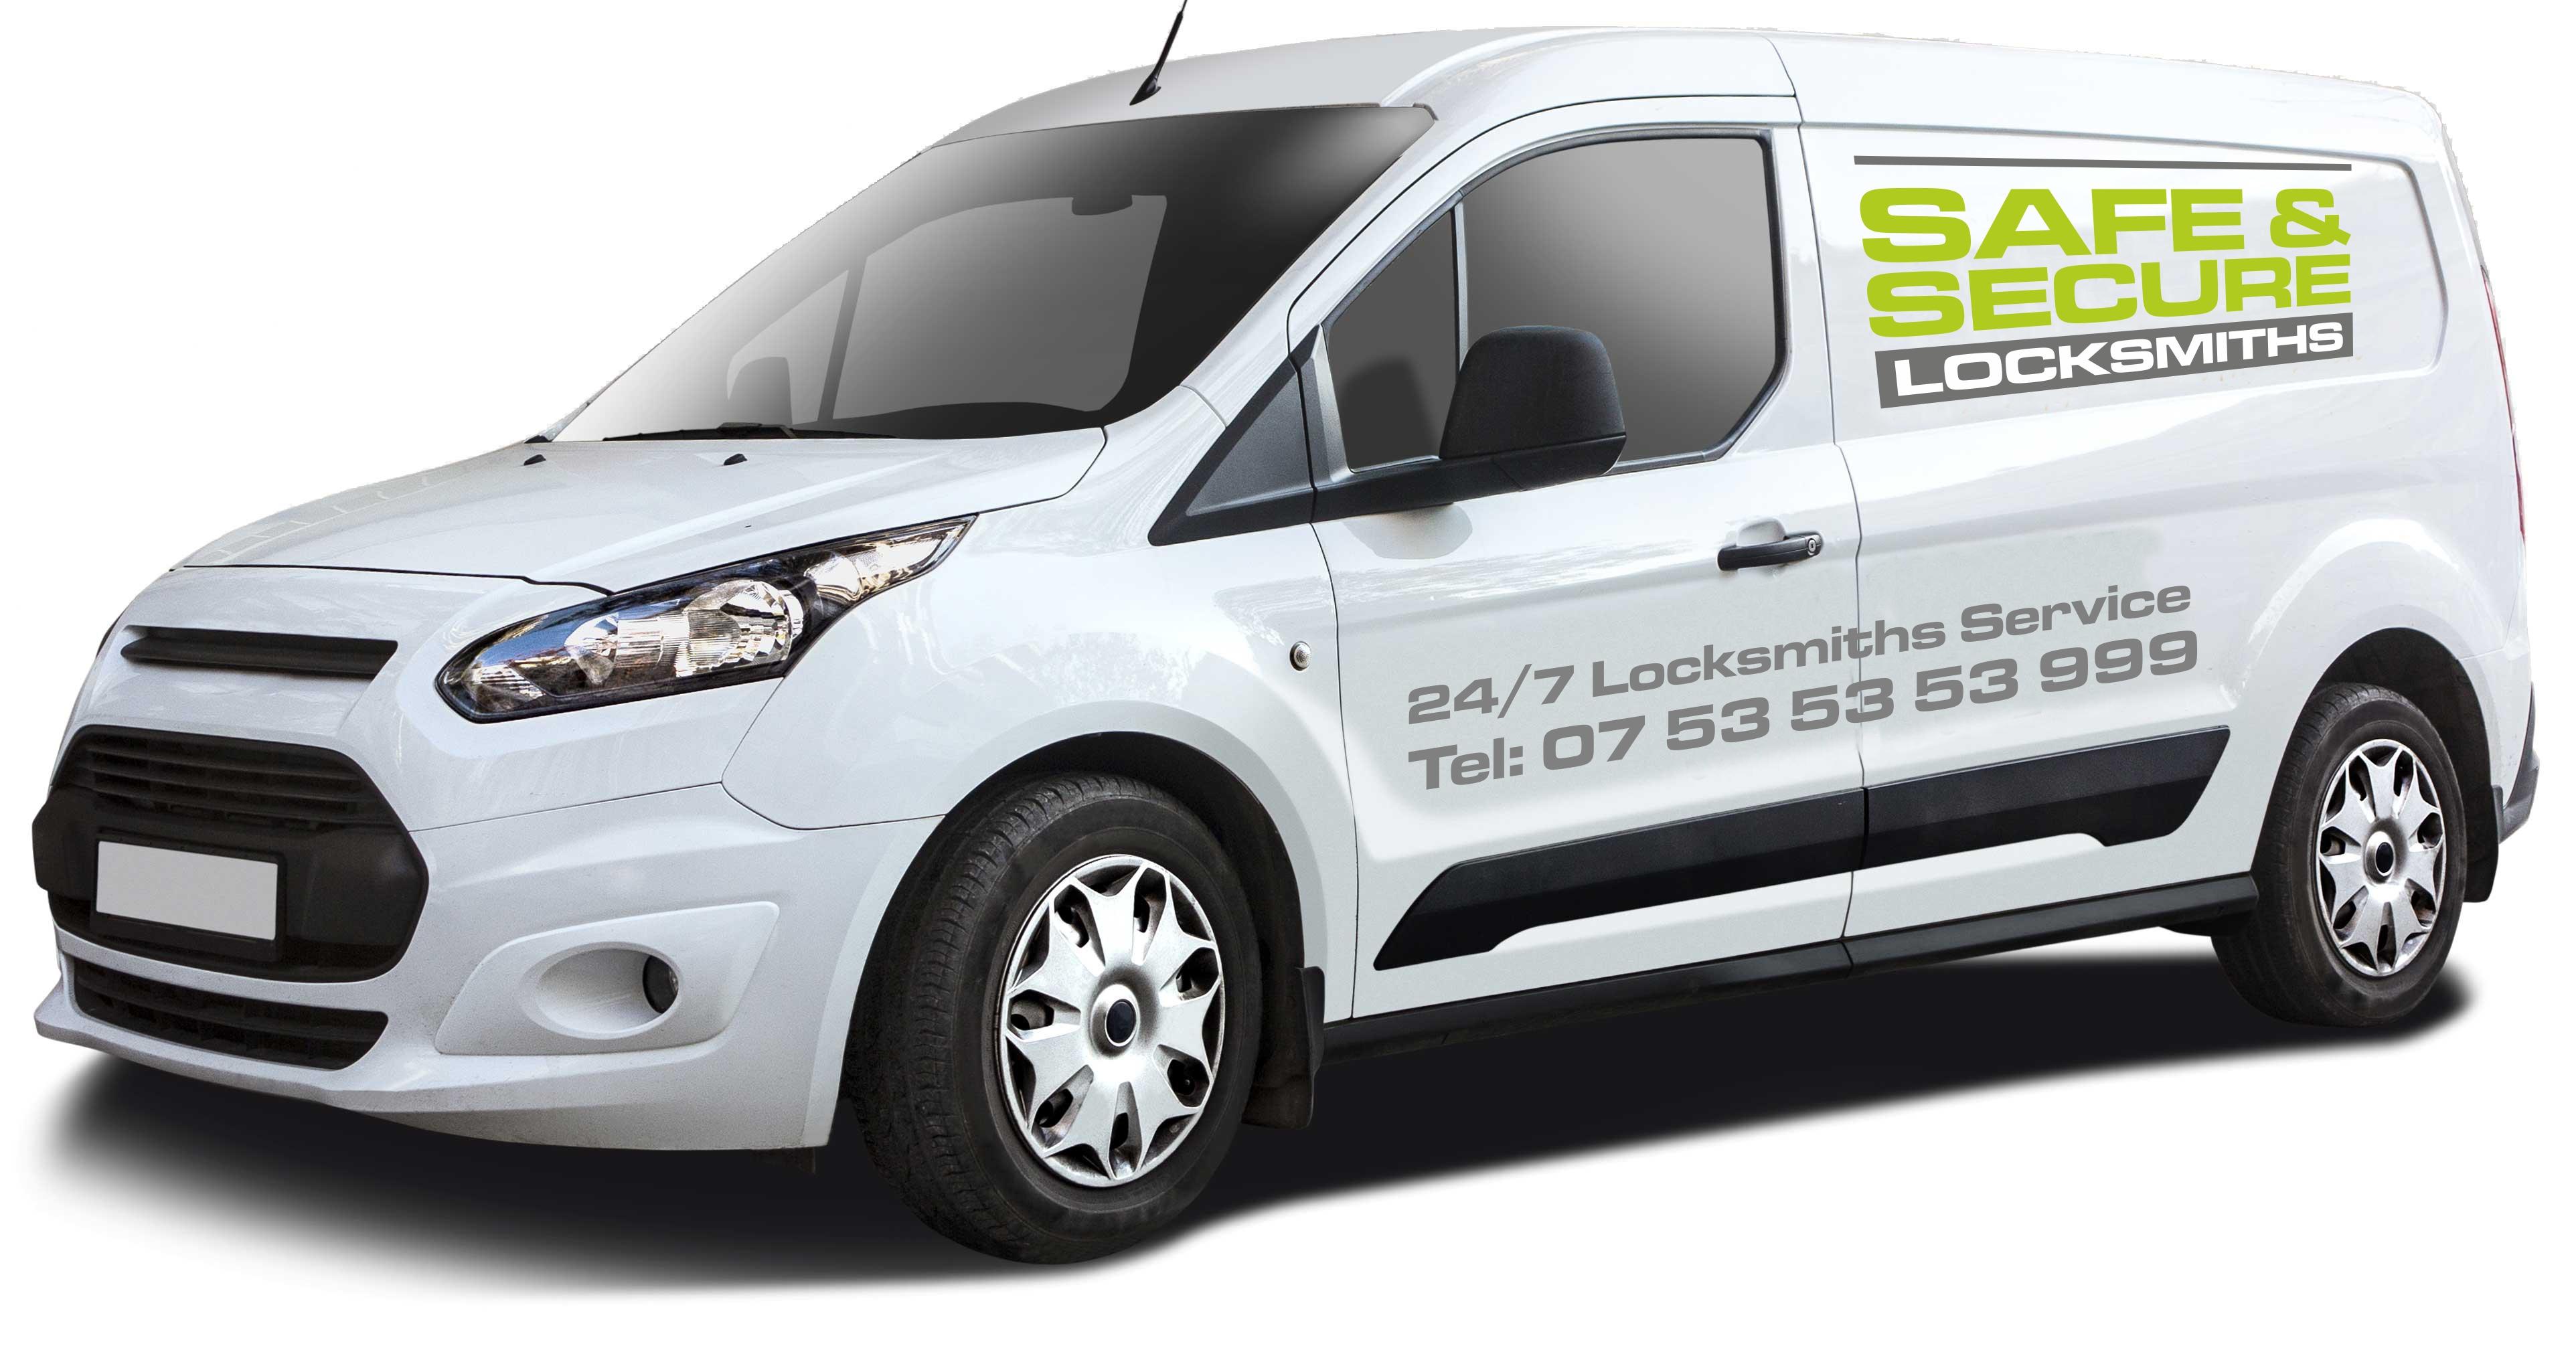 Wakefield-emergency-locksmiths